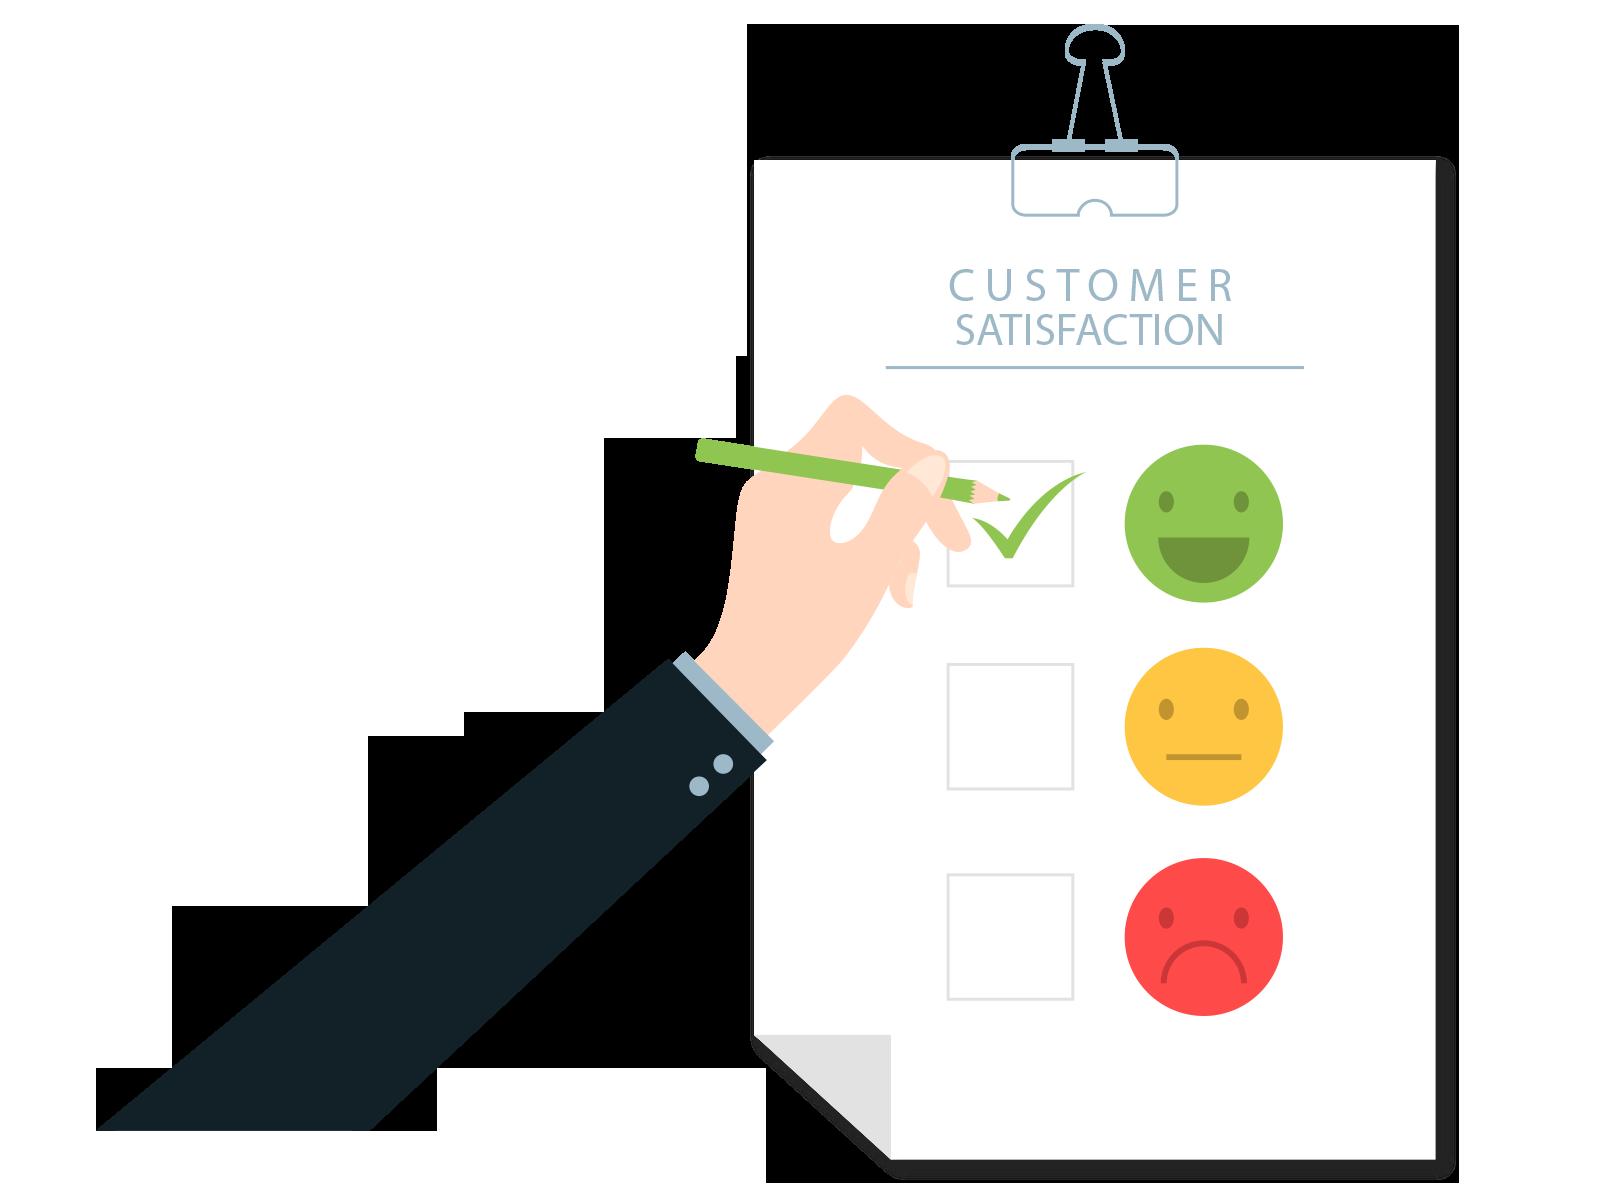 Customer Satisfaction Policy Customer Satisfaction Policy statifiction